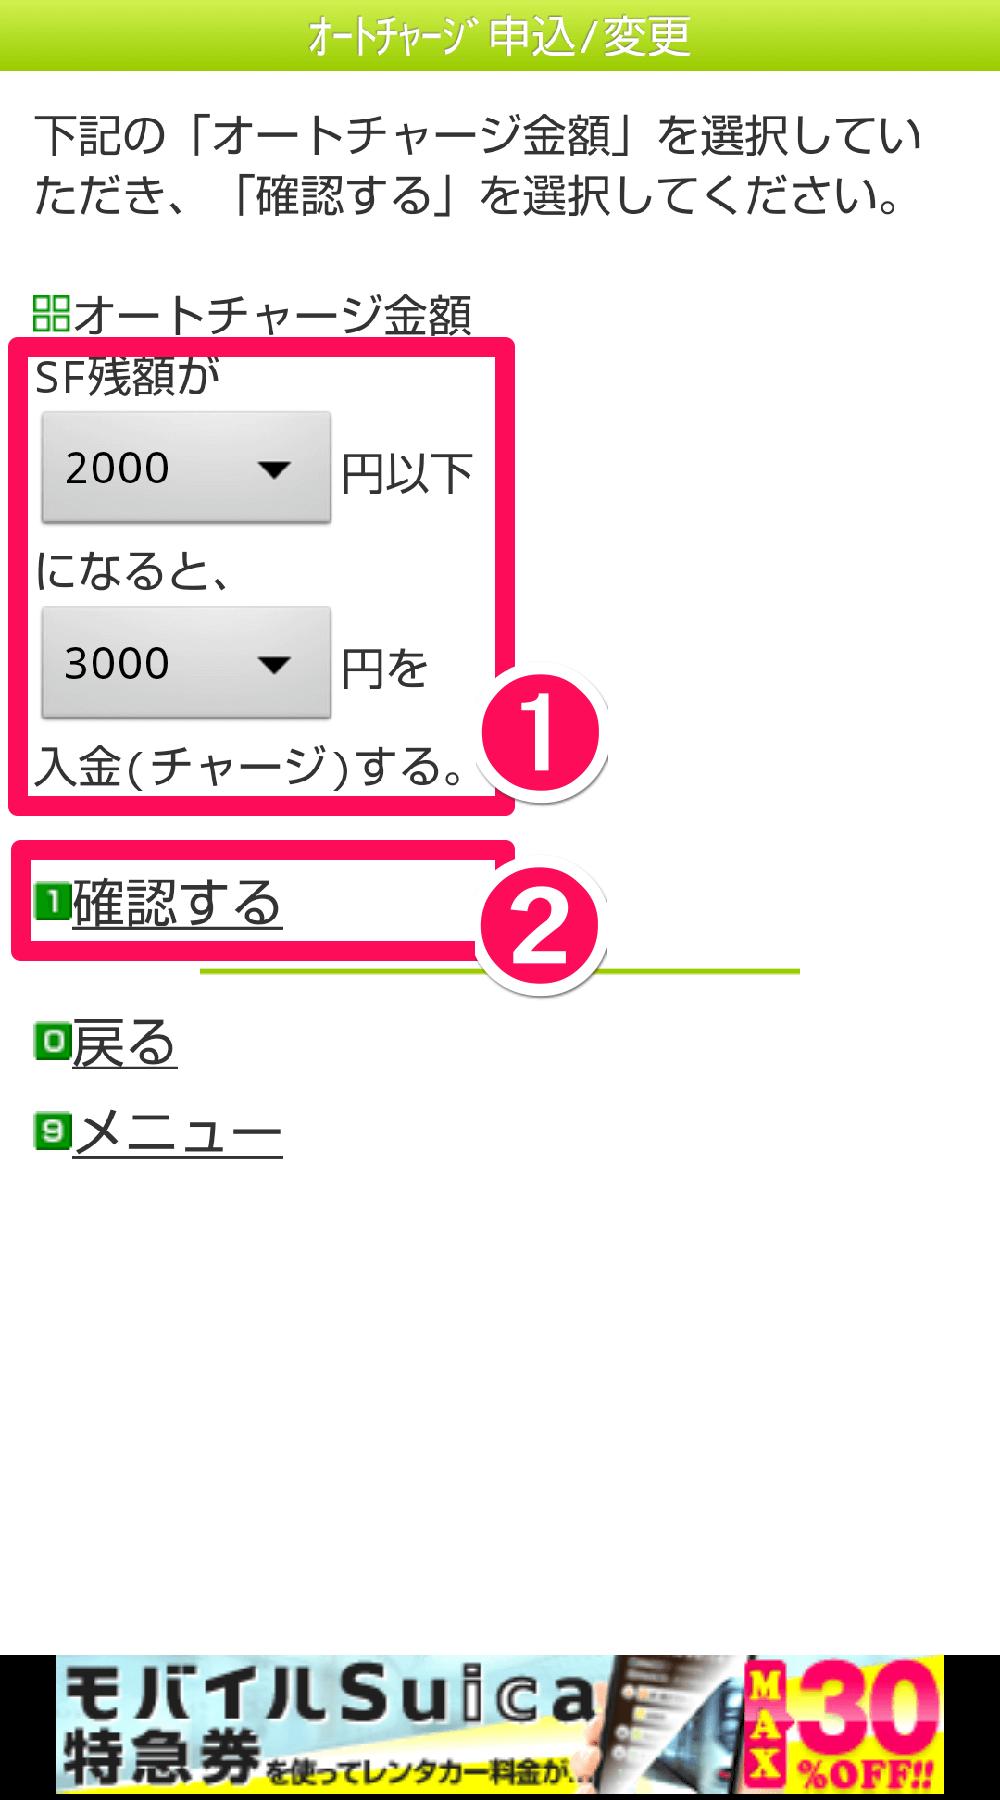 Android(アンドロイド)スマートフォン版「モバイルSuica」アプリの「オートチャージ申込/変更」画面